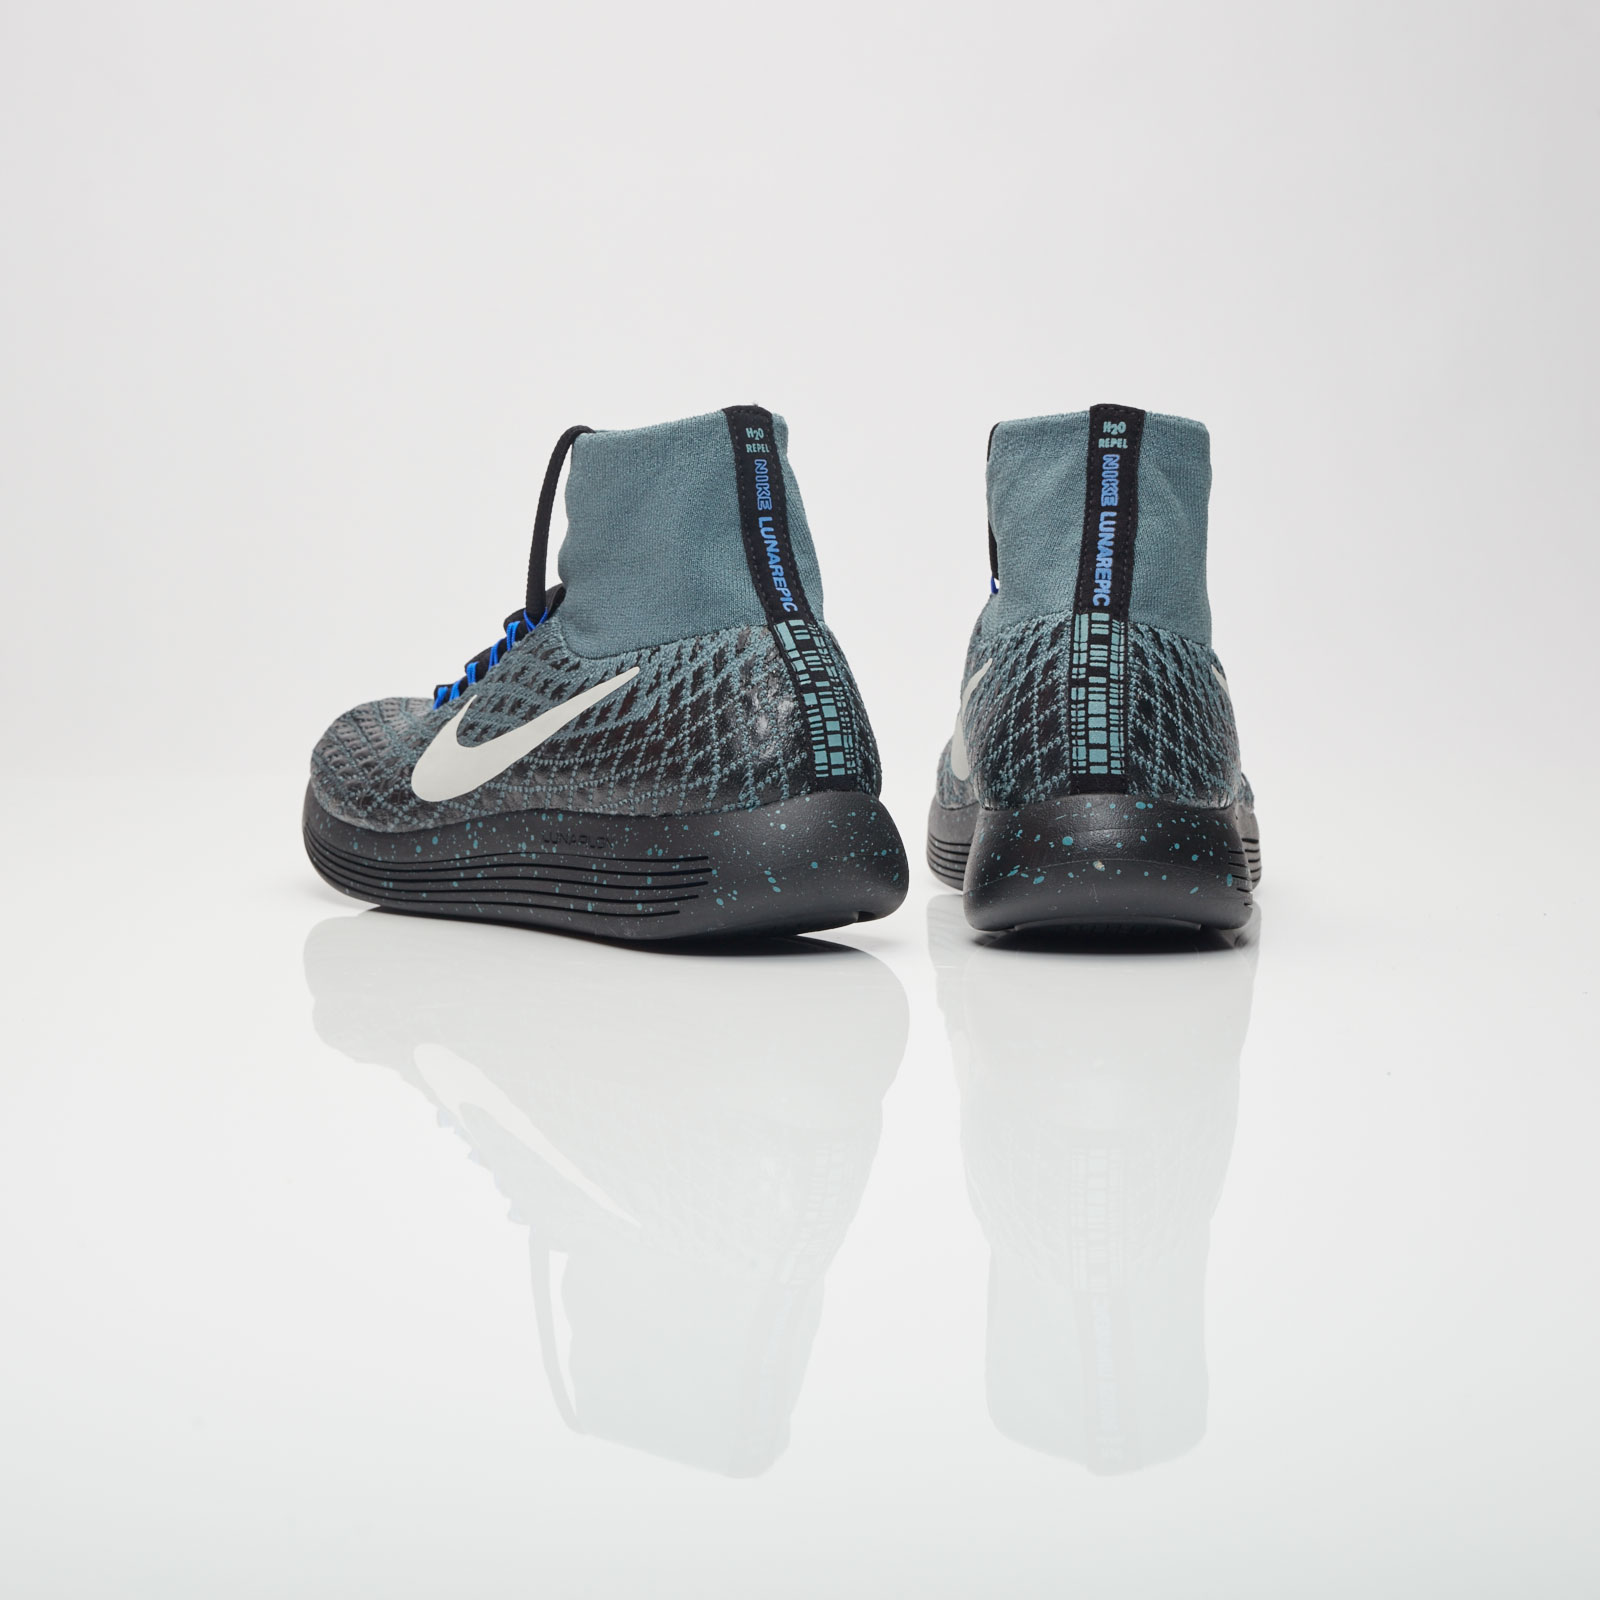 check out 21e59 6b8e6 Nike Wmns Lunarepic Fk Shield - 881678-300 - Sneakersnstuff   sneakers    streetwear online since 1999